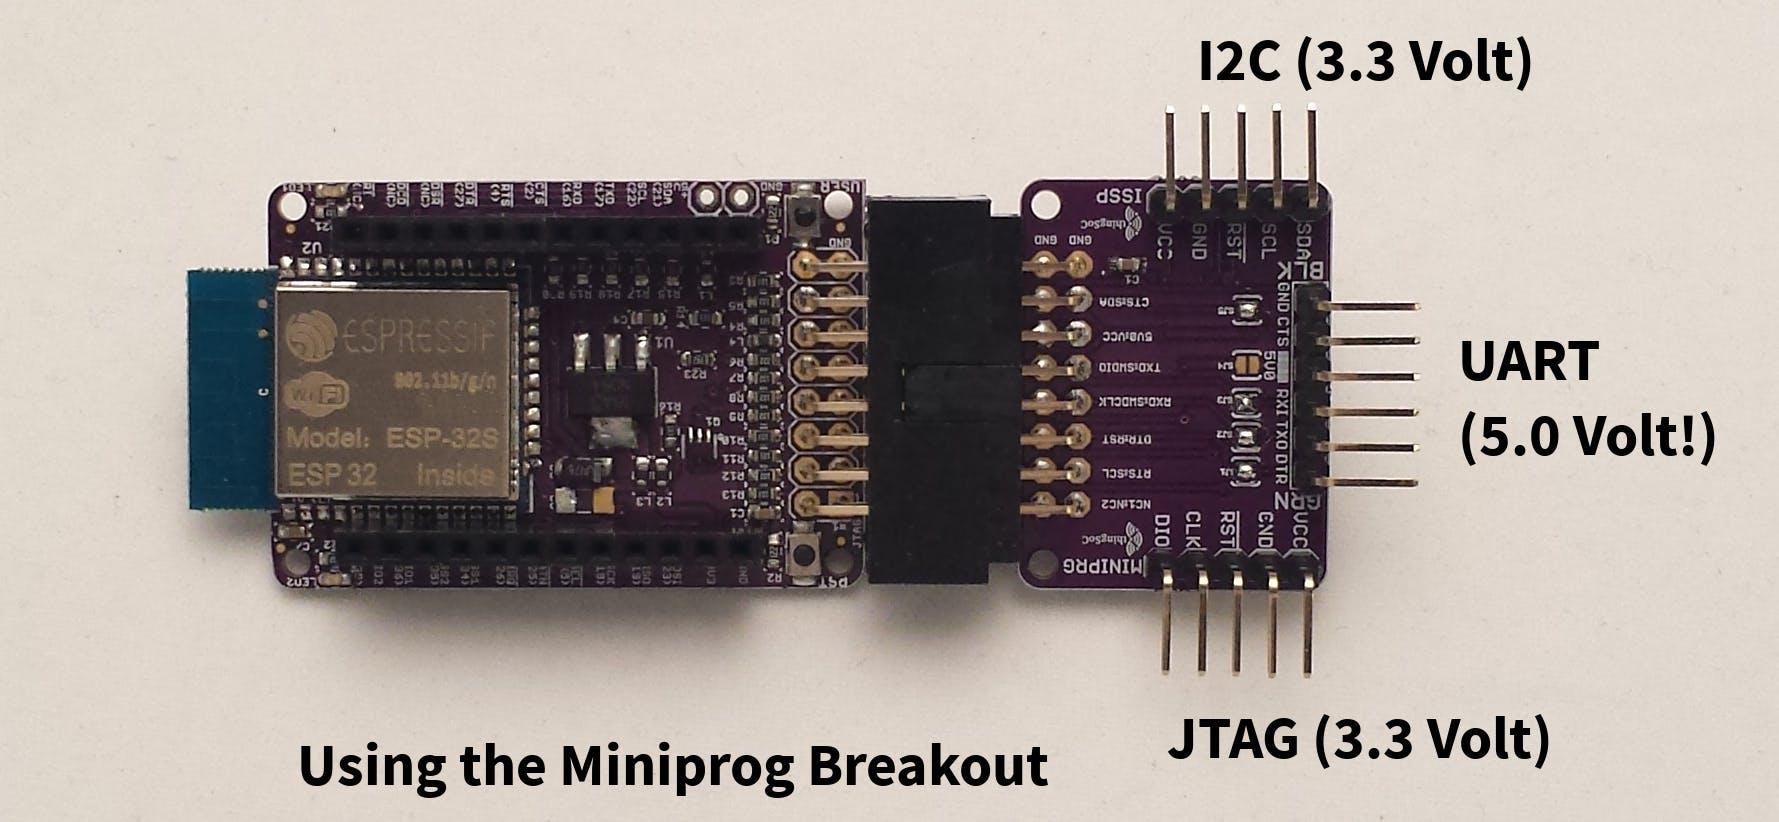 ESP32 with JTAG Breakout